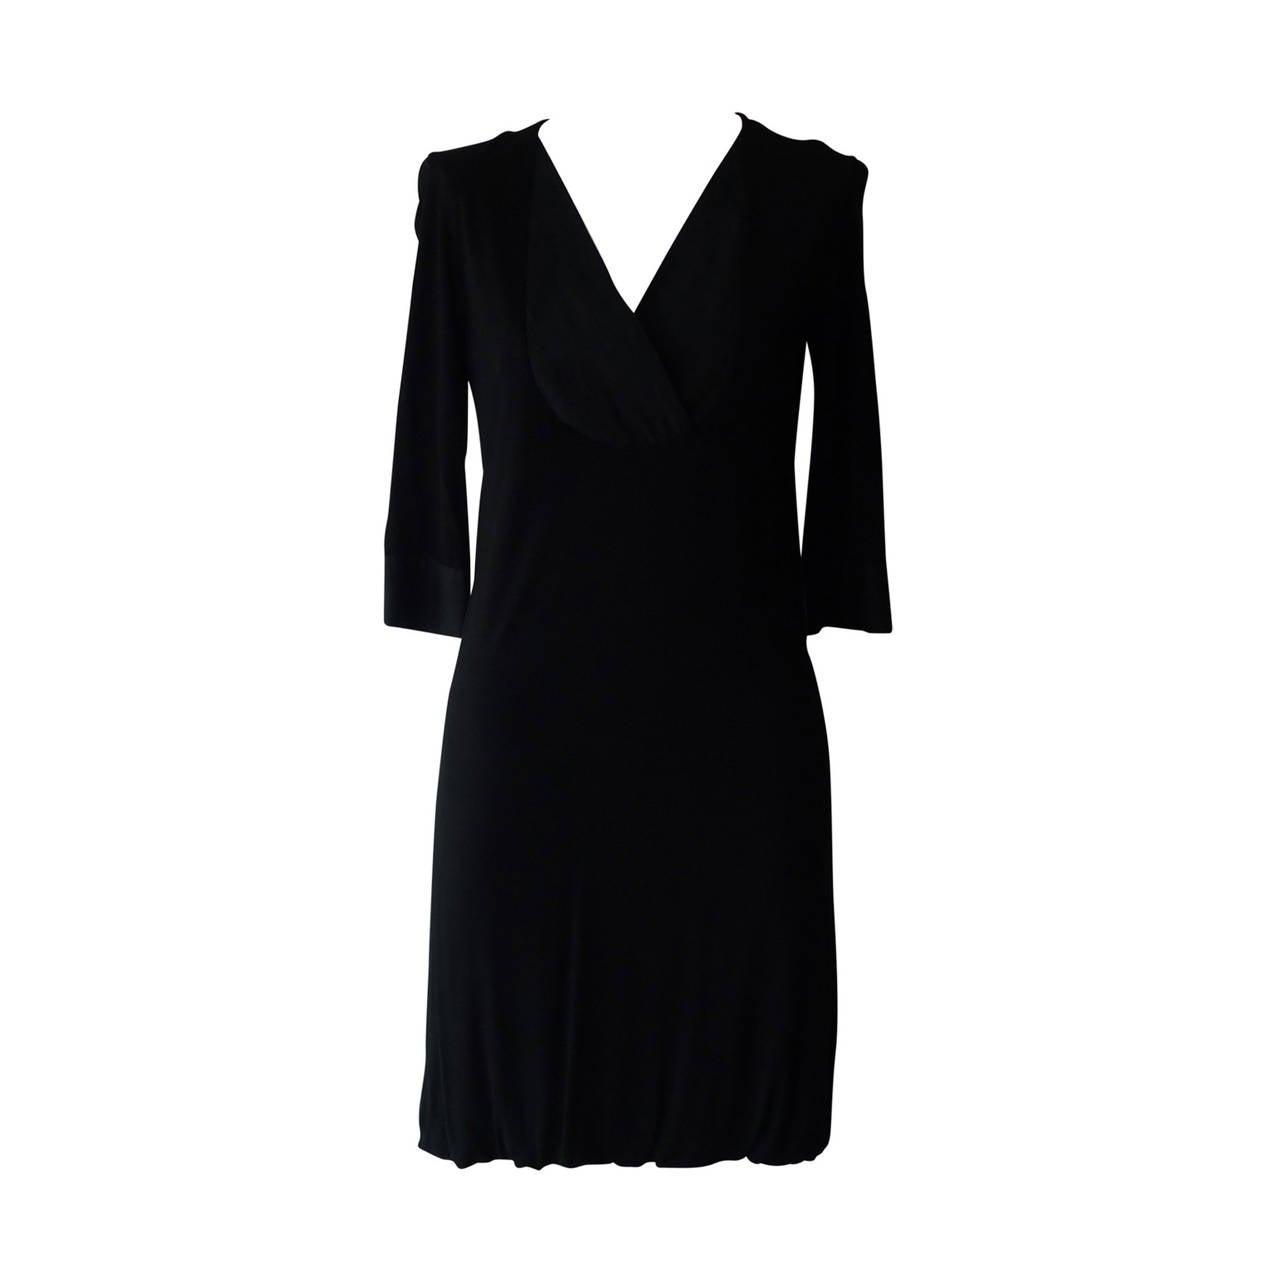 Martin Margiella Simple Little Black Dress (40)